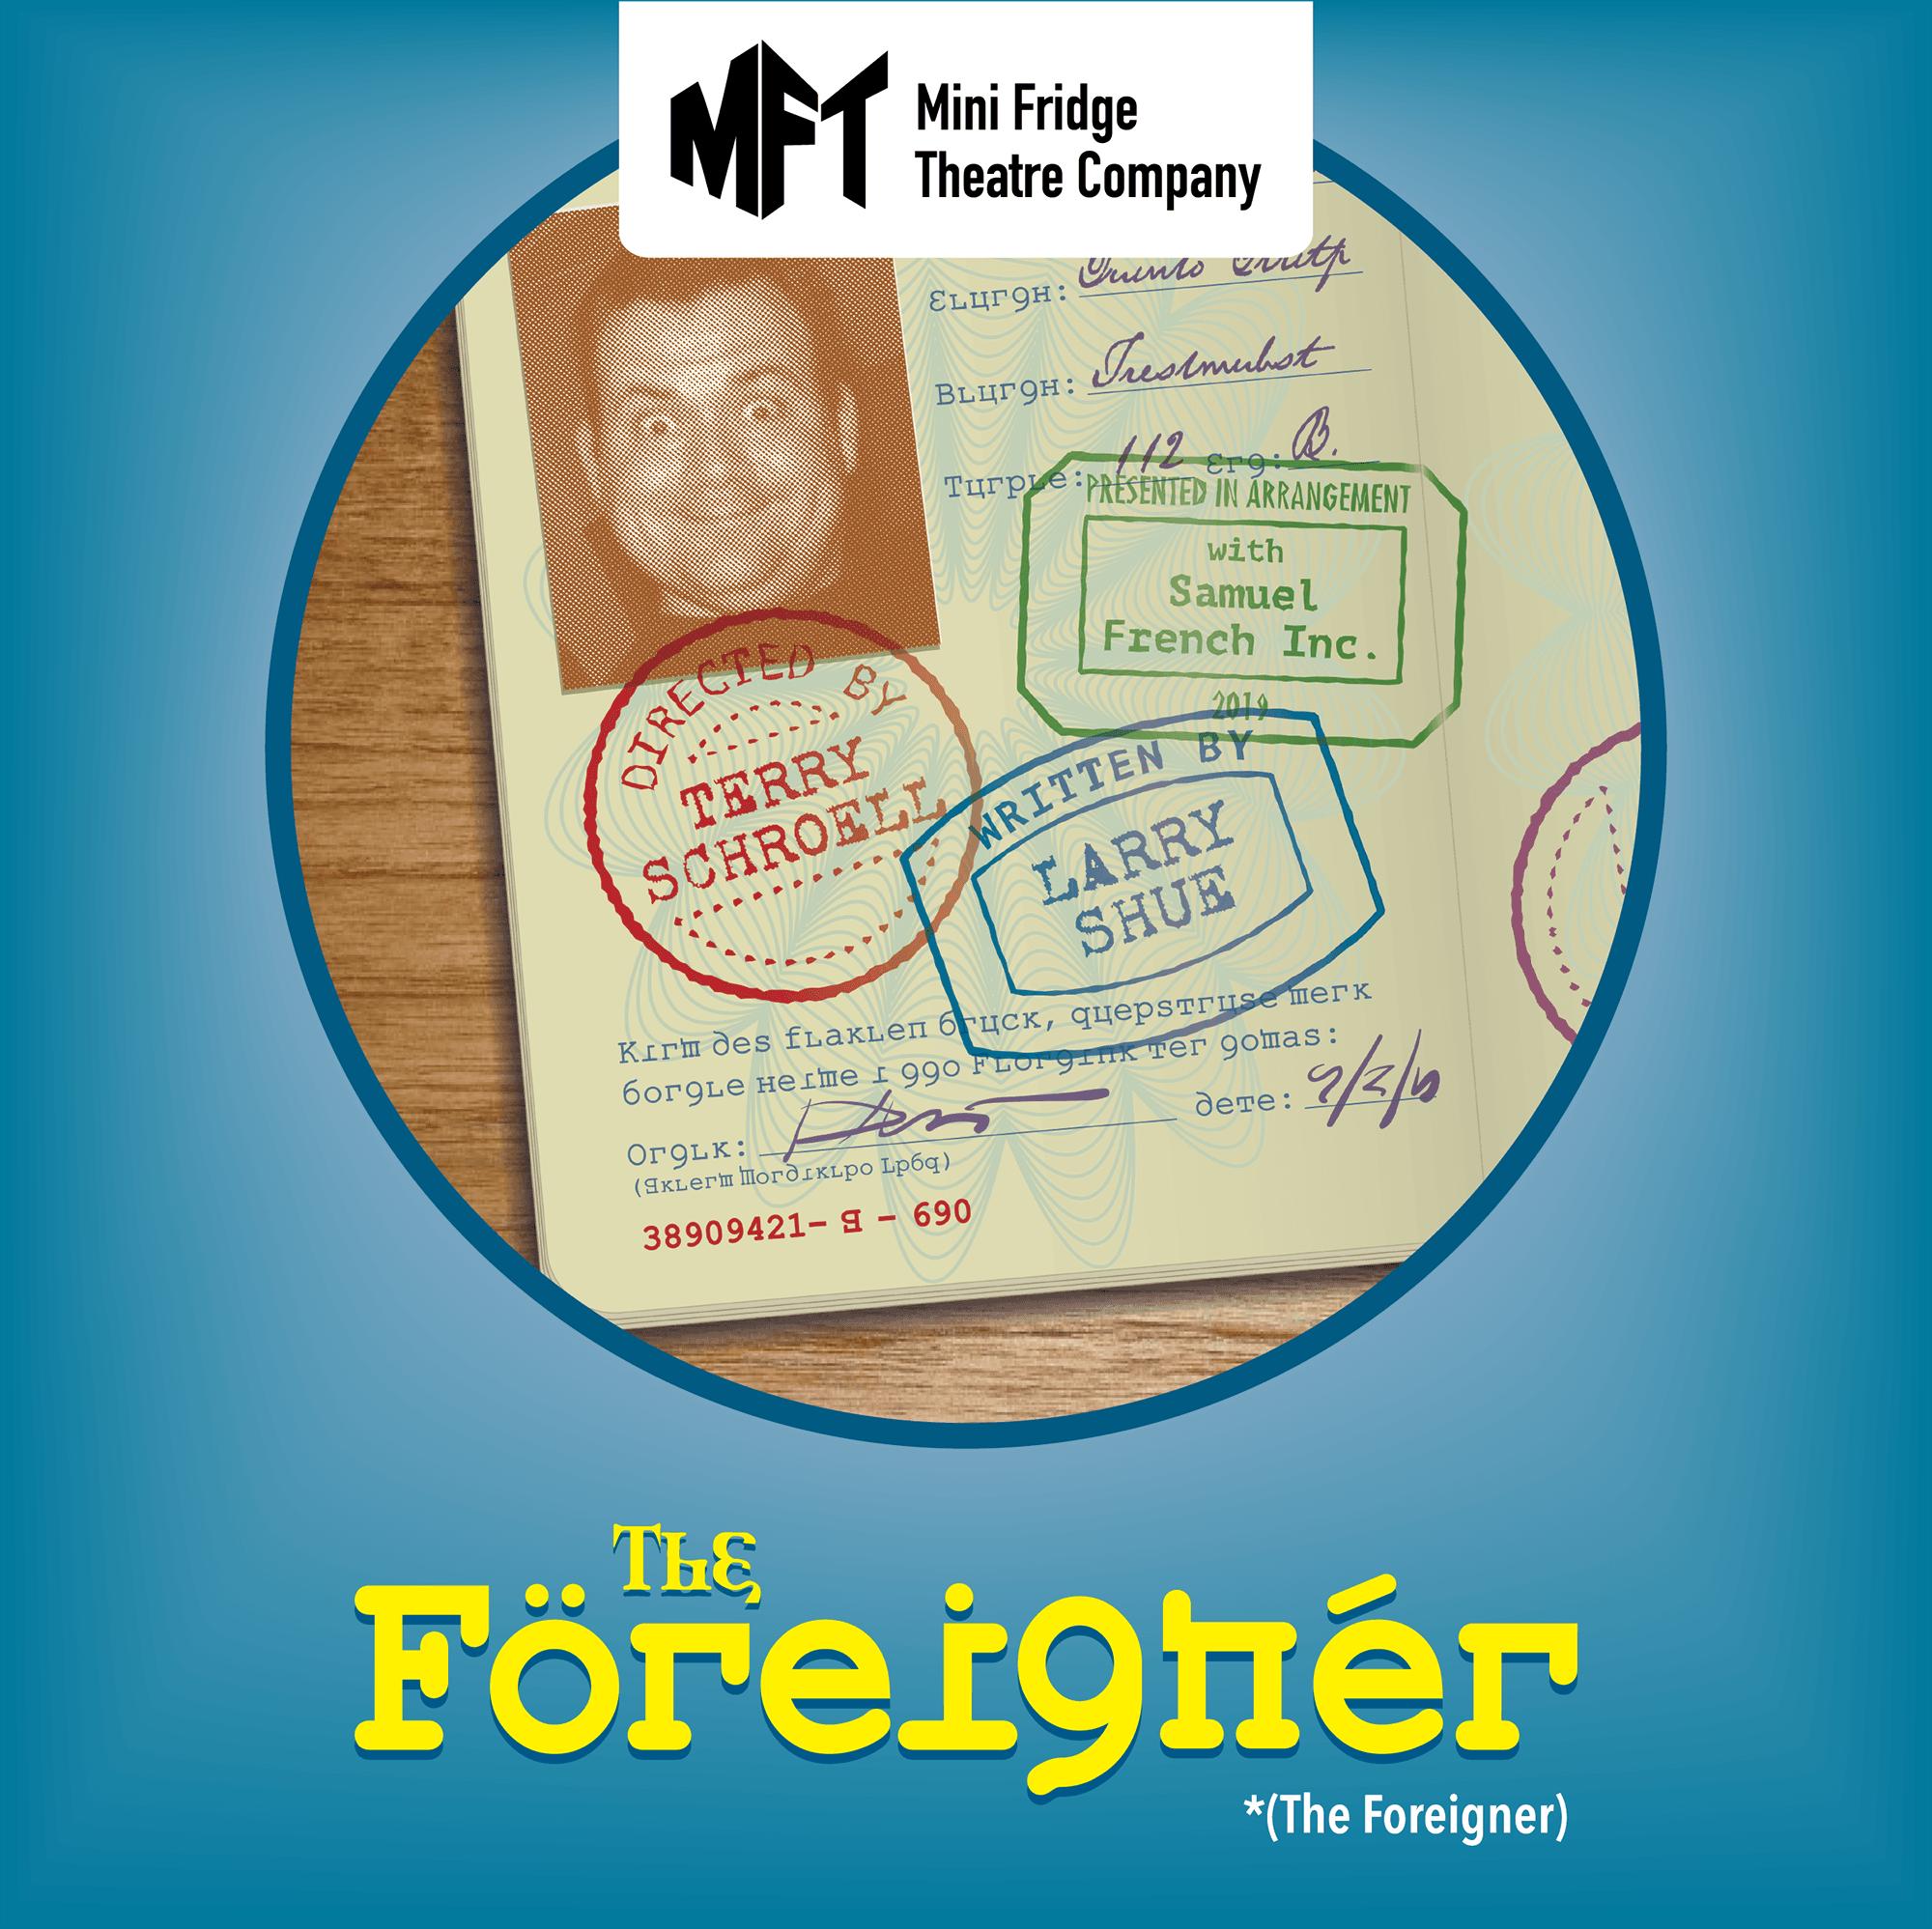 Foreigner - Website Square